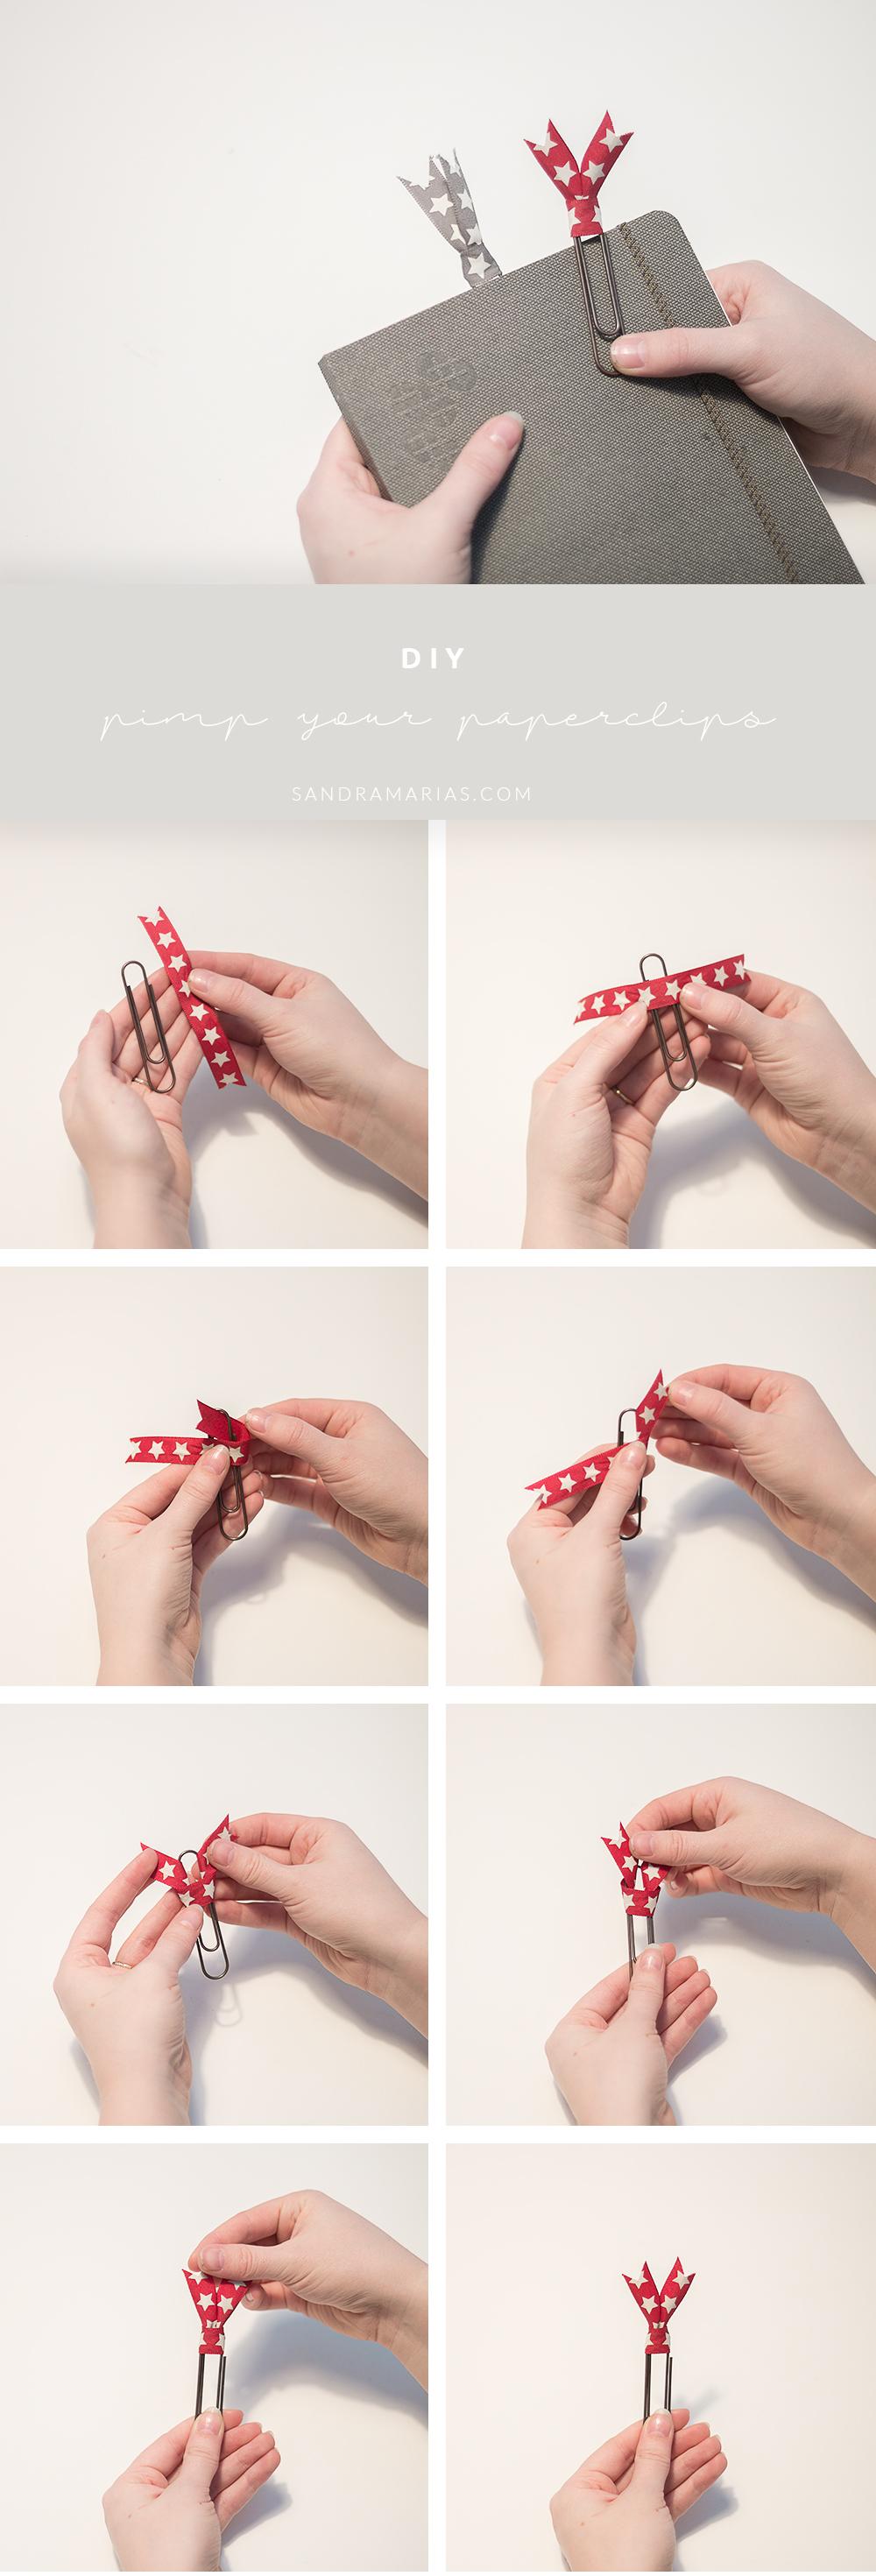 Pimp your paperclips | Cute paperclips | DIY | Sandramarias.com